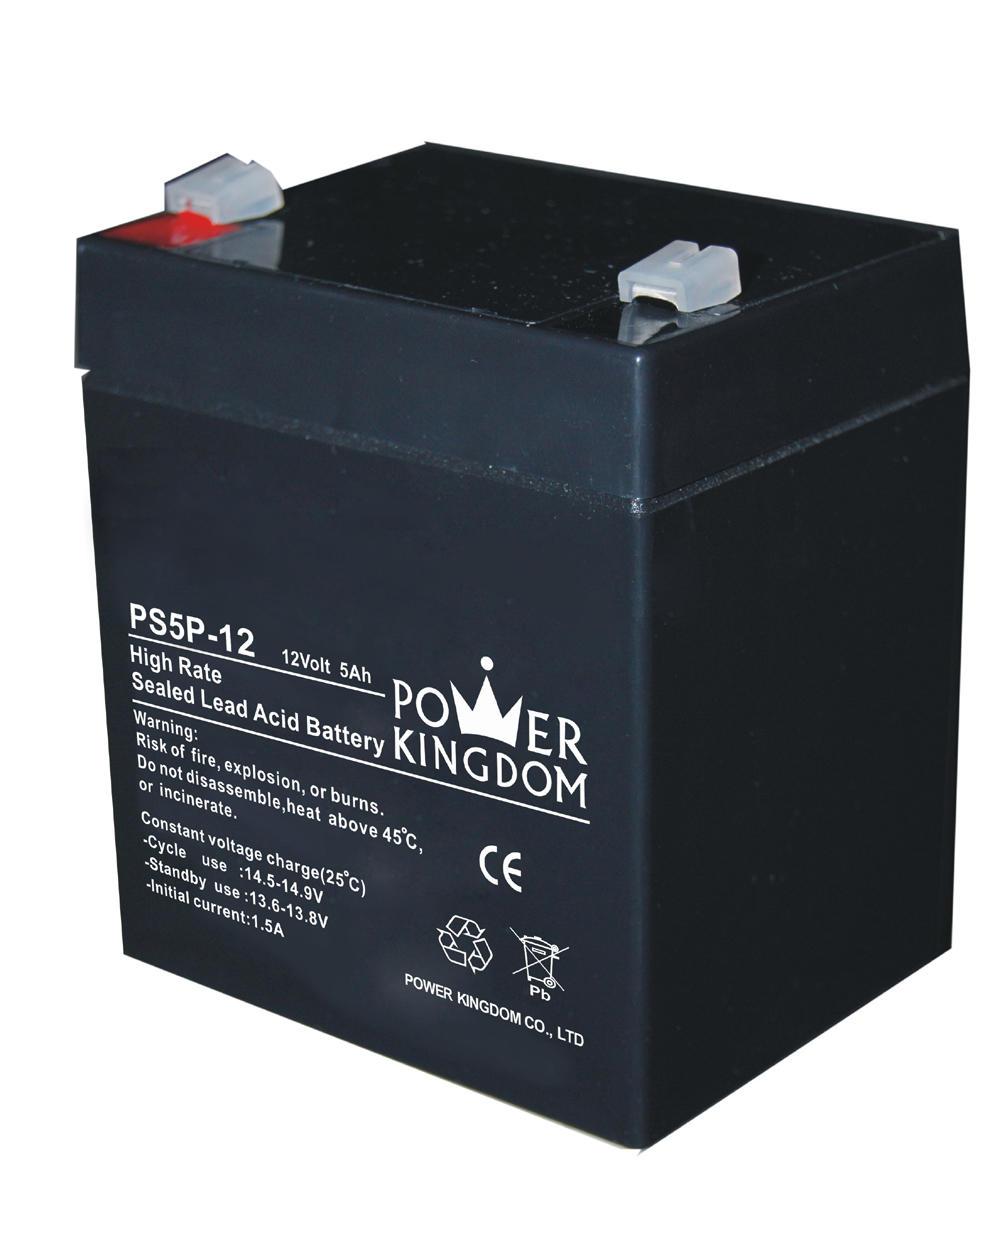 Power Kingdom high rate series 5ah 12v sealed lead acid battery